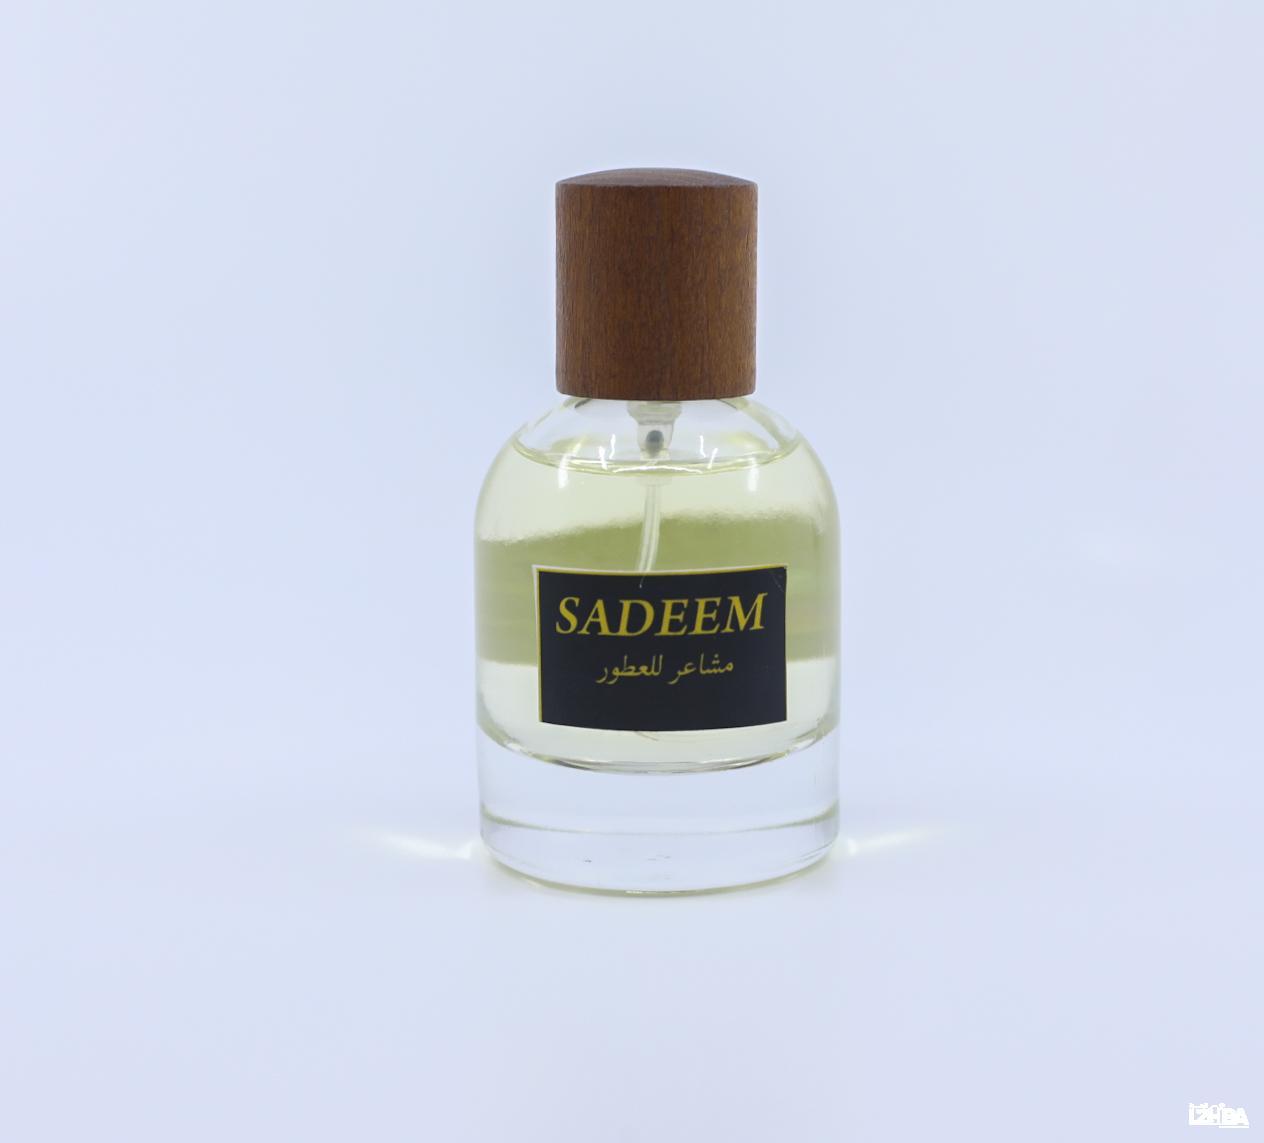 Sadeem Perfume